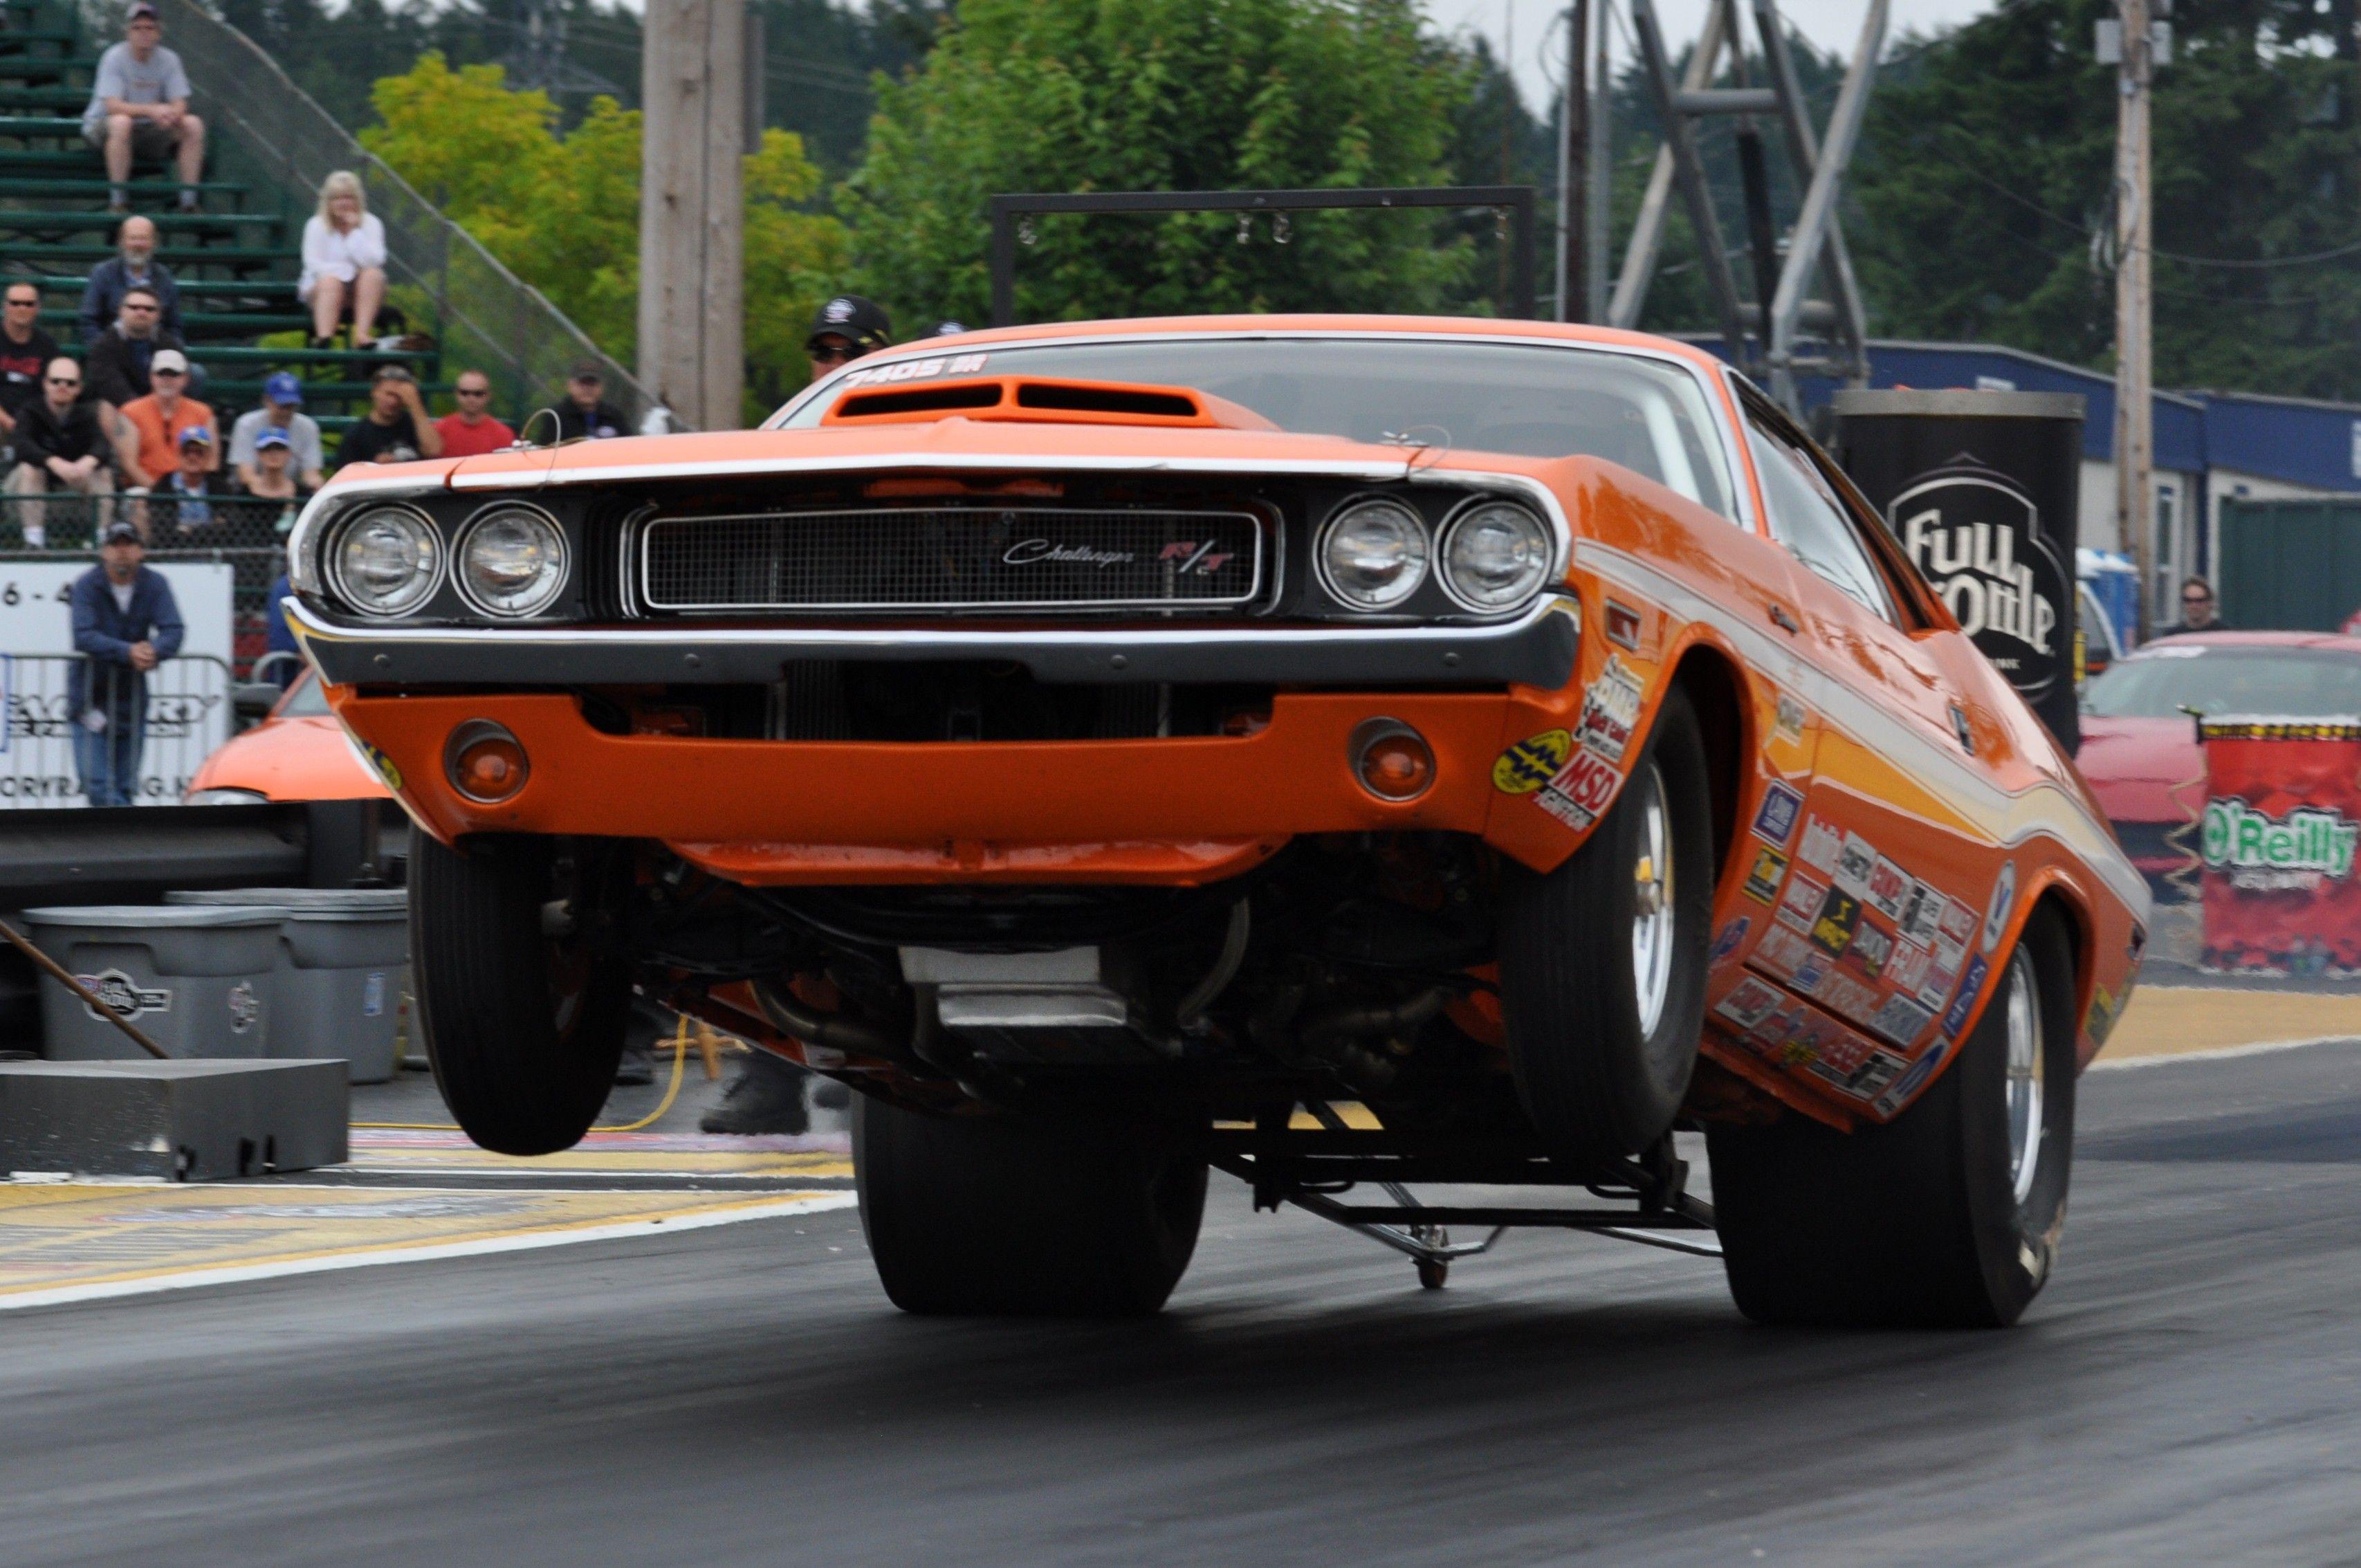 Mopar Wheelie | Wheelies | Pinterest | Mopar, Cars and Dodge ...